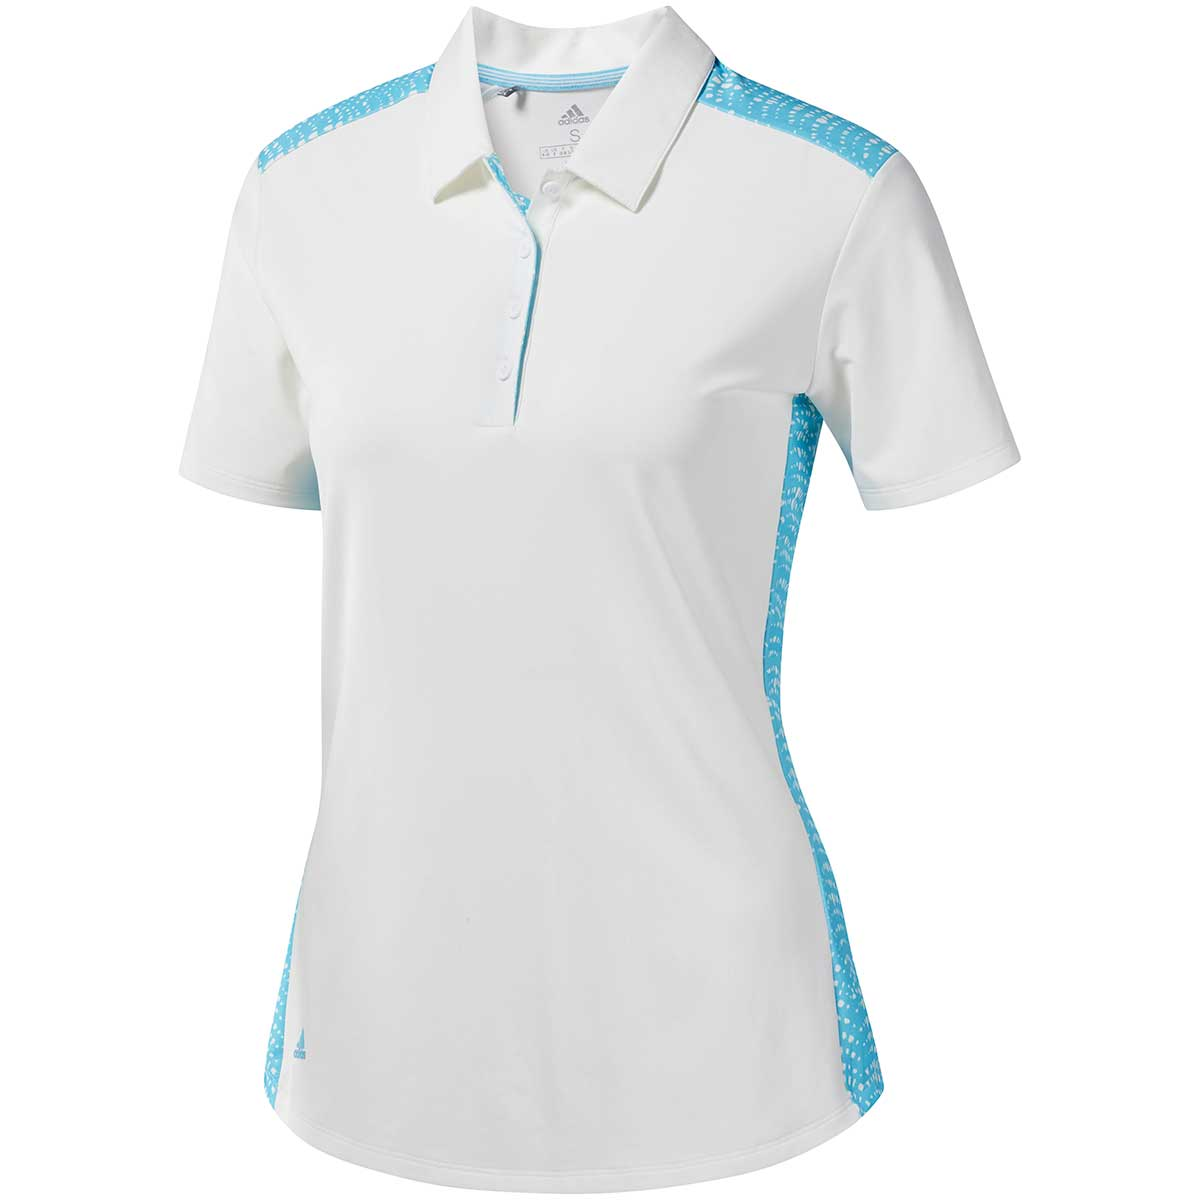 Adidas Women's Ultimate365 Novelty Polo Shirt - White/Cyan